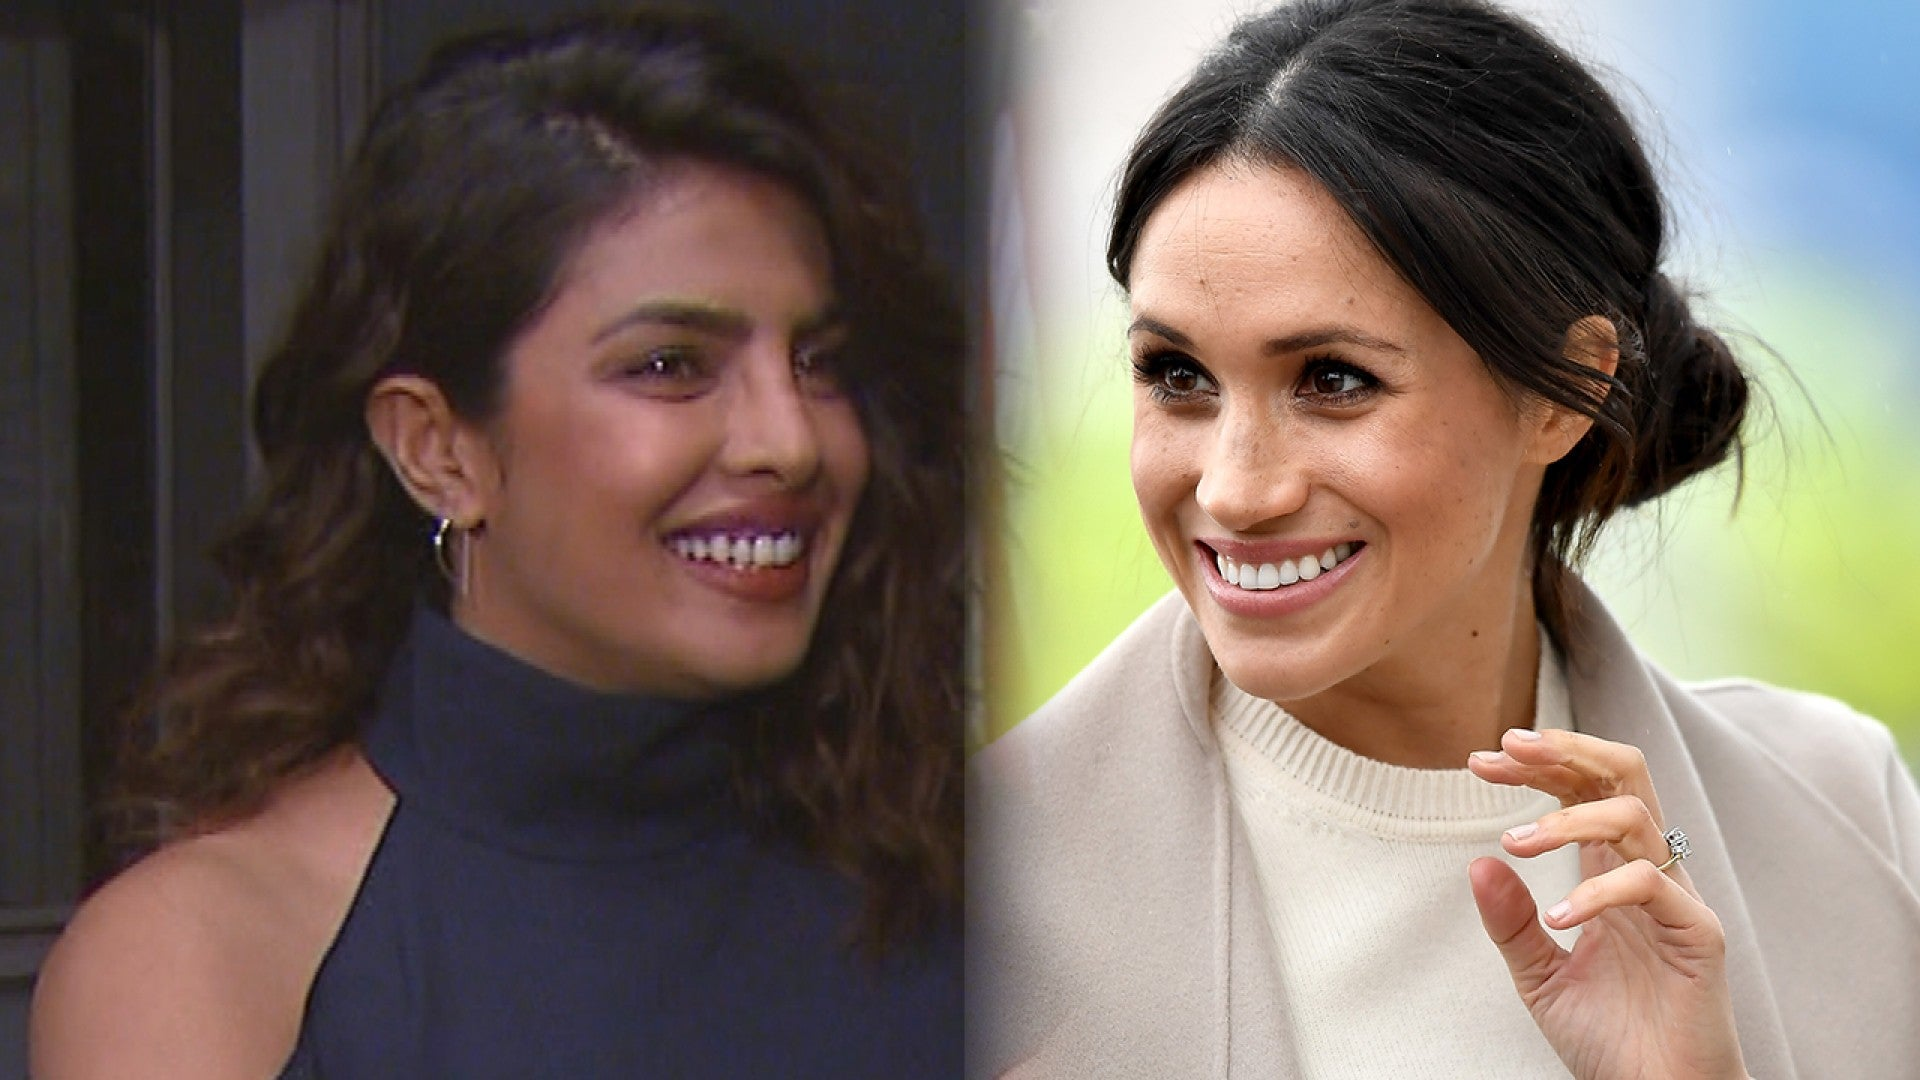 cHODENTK: Royal Wedding Prince Harry Meghan Markle Priyanka